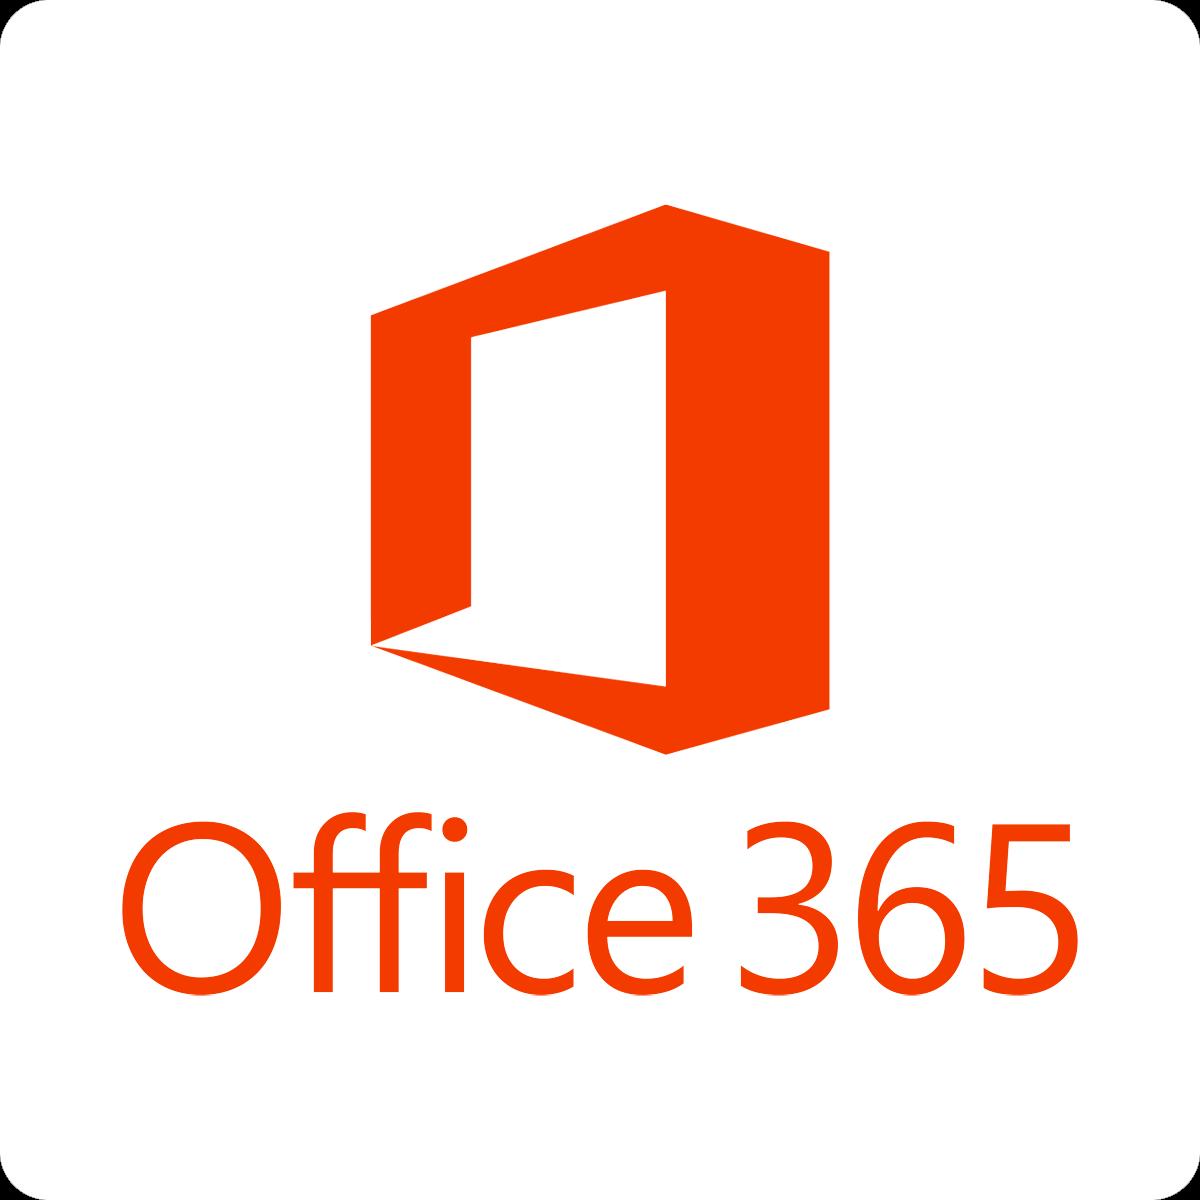 Microsoft Office 365 Product Key Full Crack 2019 Full Version [Working]